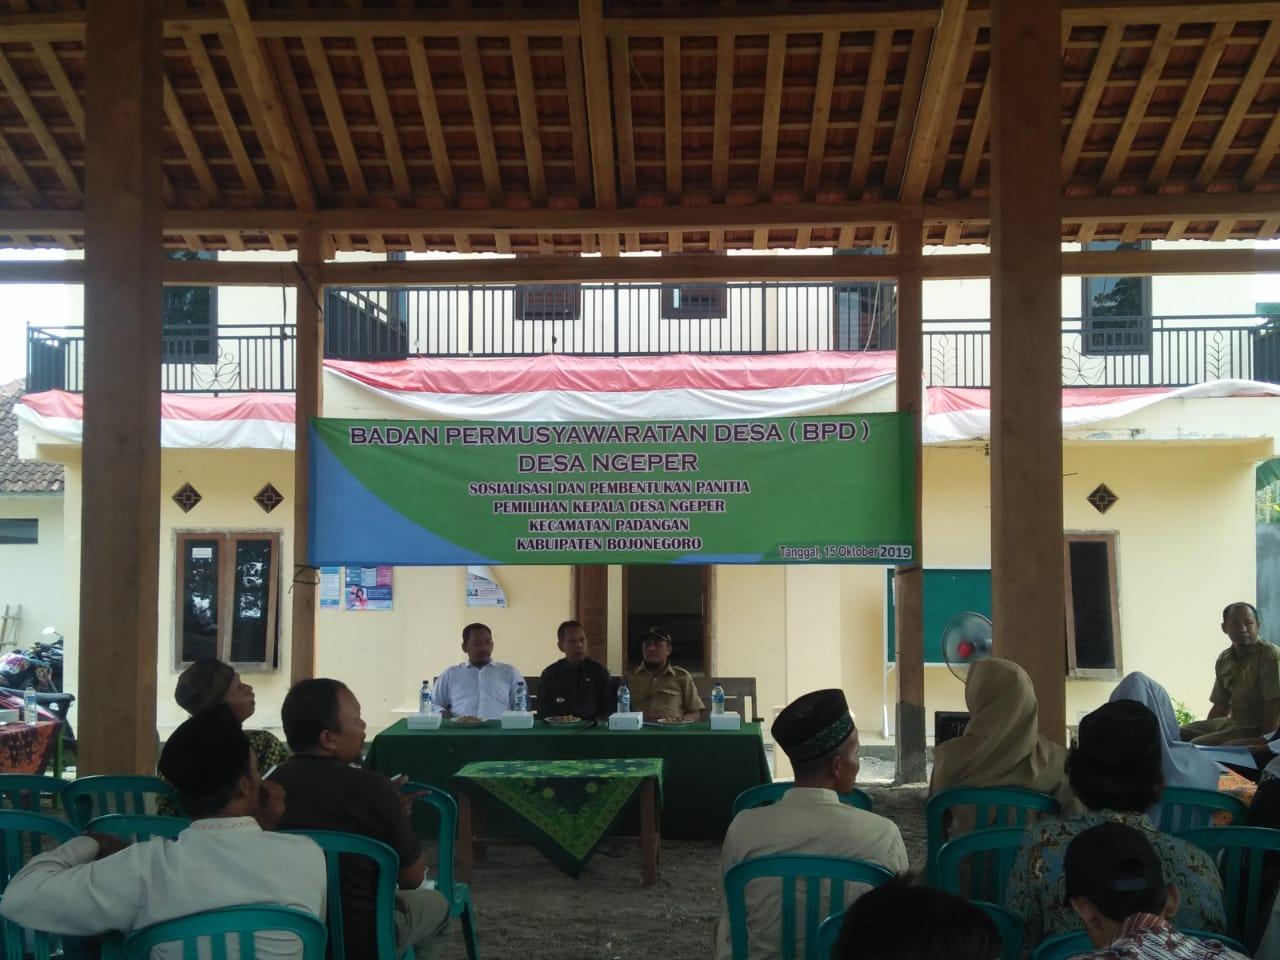 Musyawarah Pembentukan dan Pelantikan Panitia Pemilihan Kepala Desa<BR>Desa Ngeper Kecamata padangan